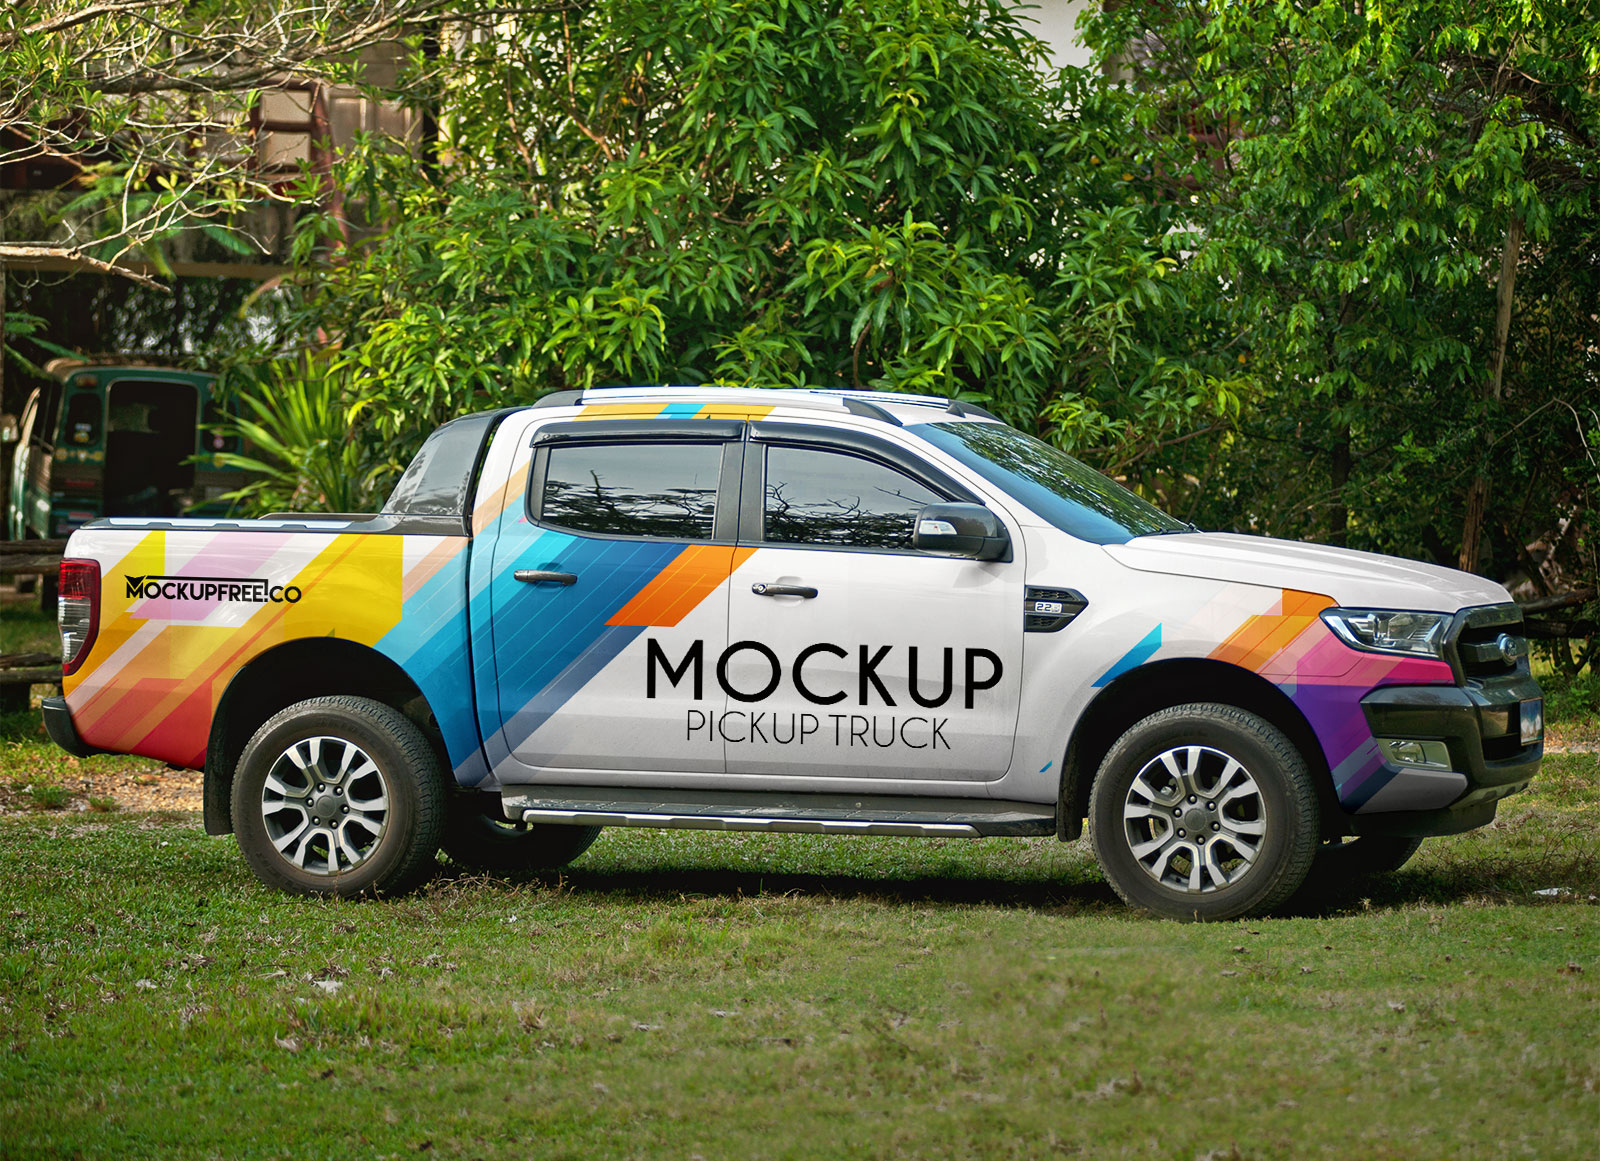 Free-Vehicle-Branding-Pickup-Truck-Mockup-PSD